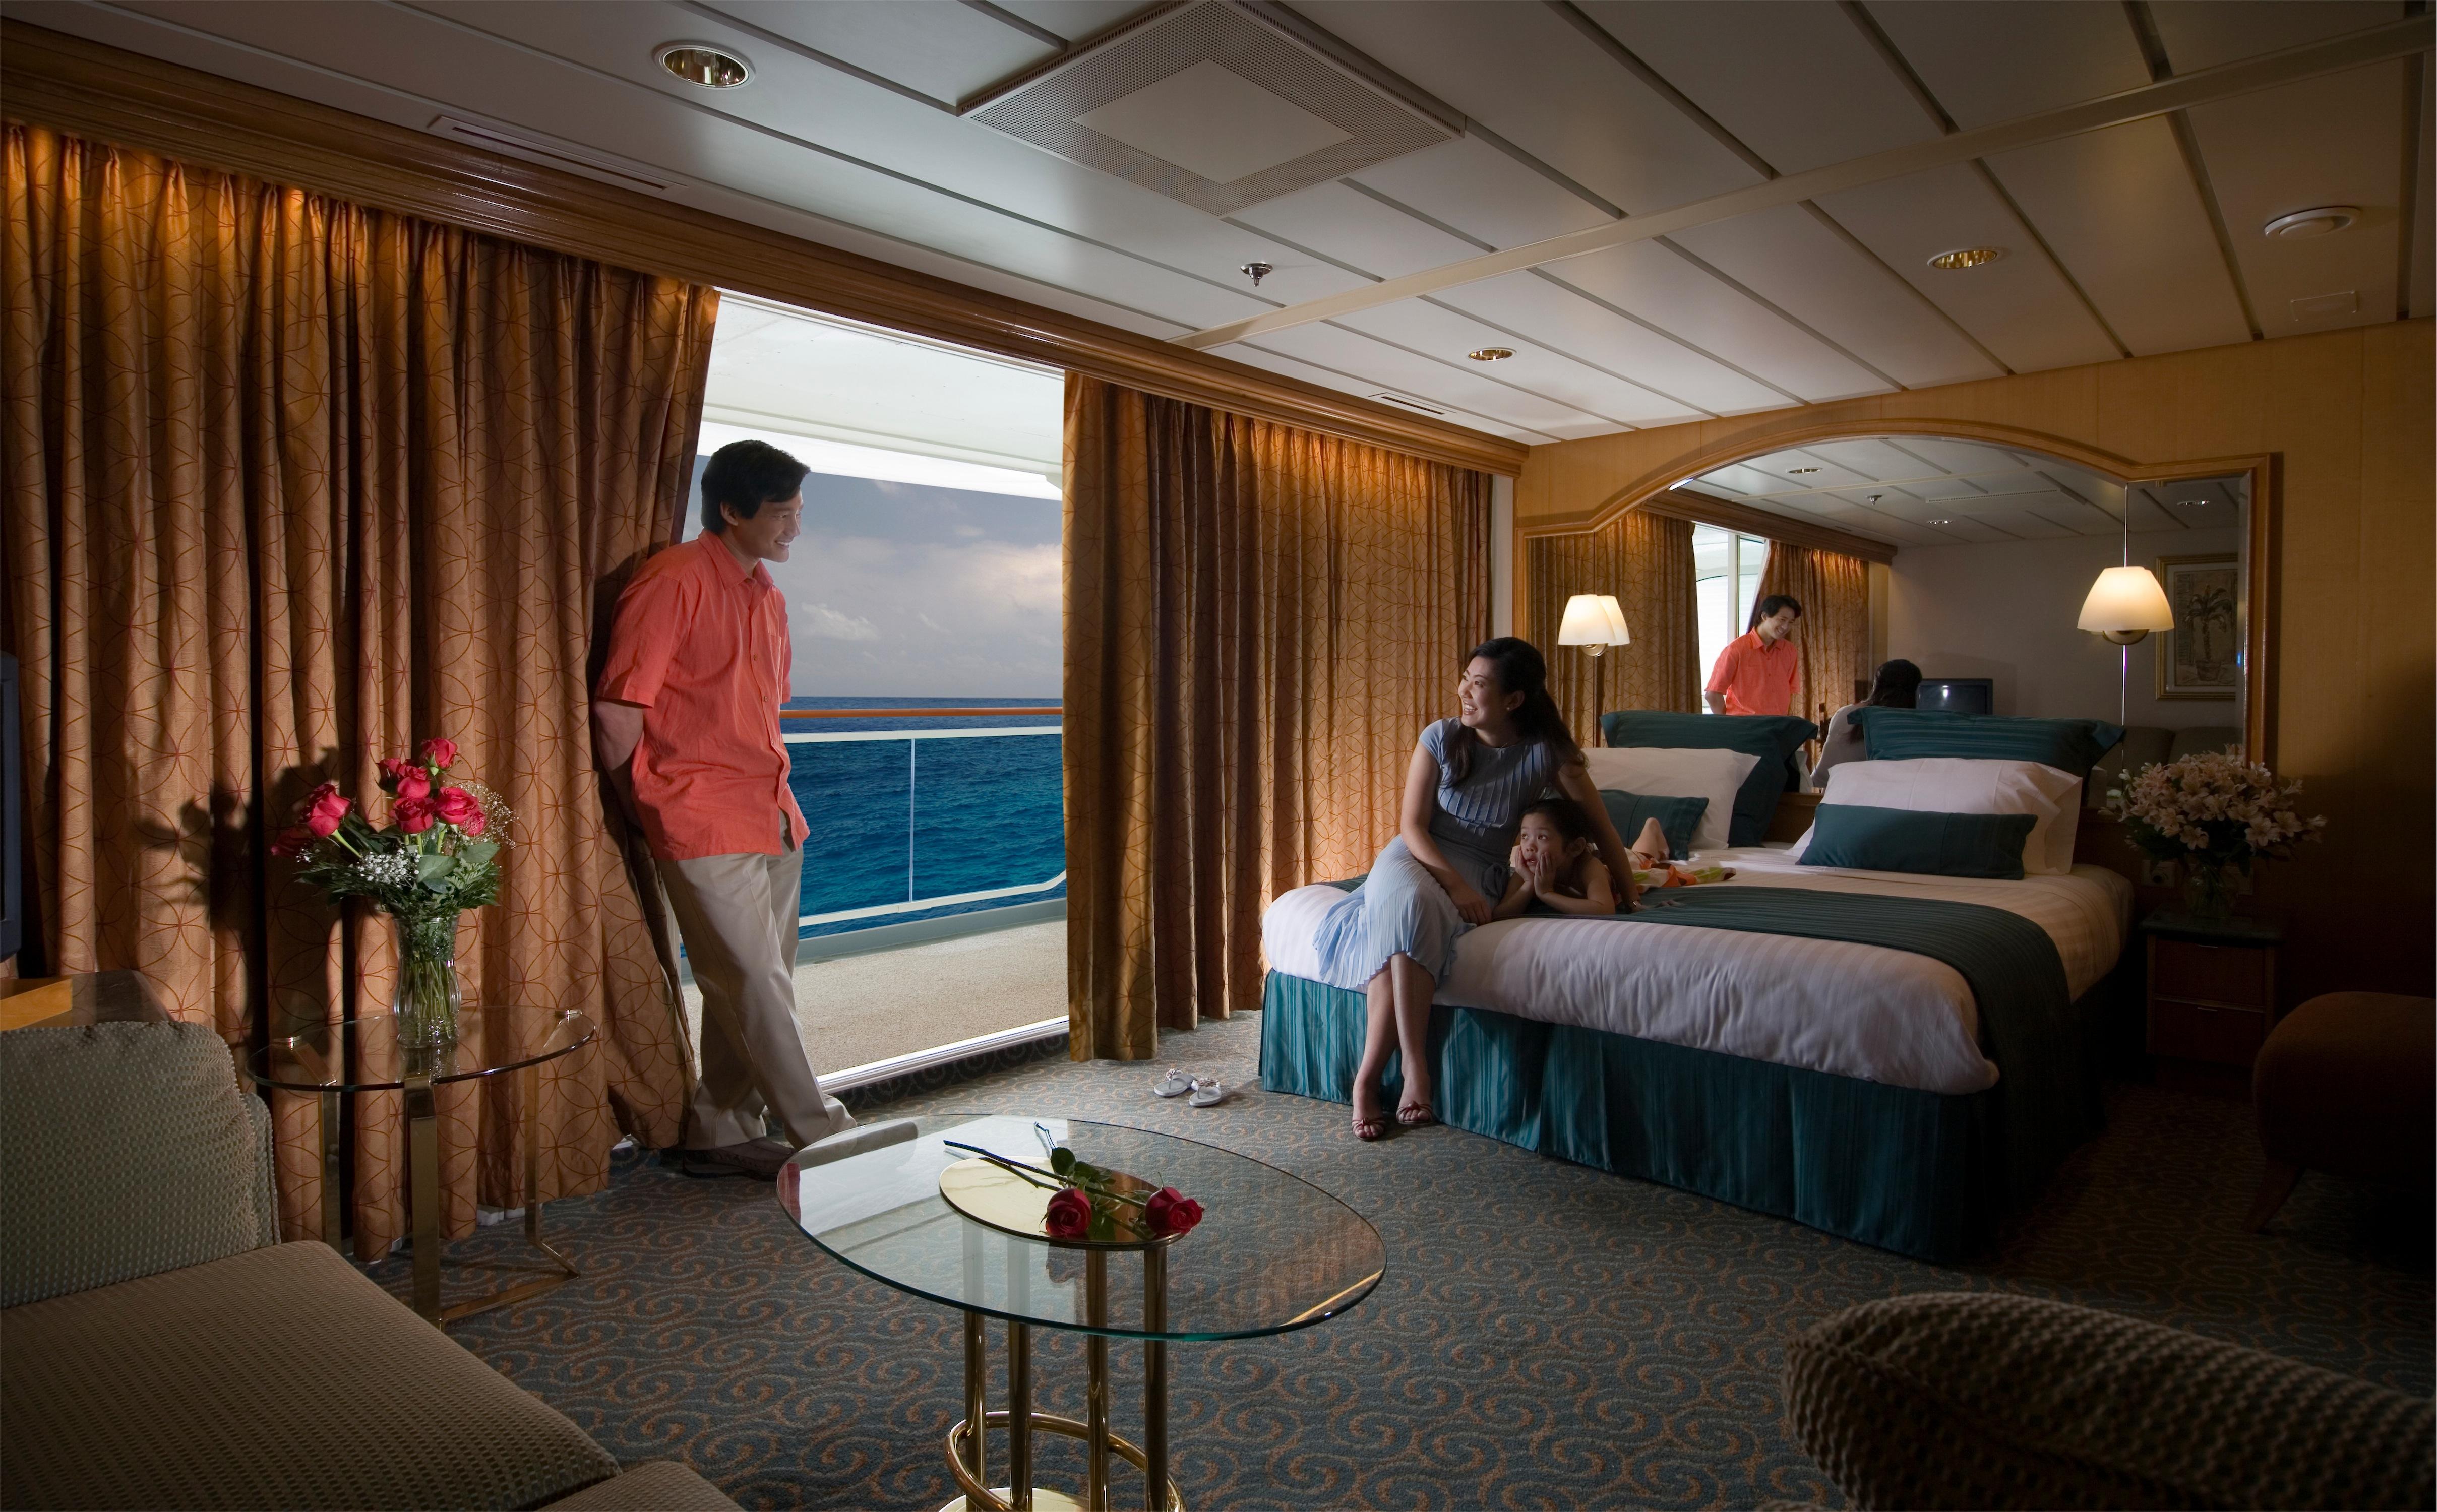 Royal Caribbean International Rhapsody of the Seas Accommodation Grand Suite 2.jpg